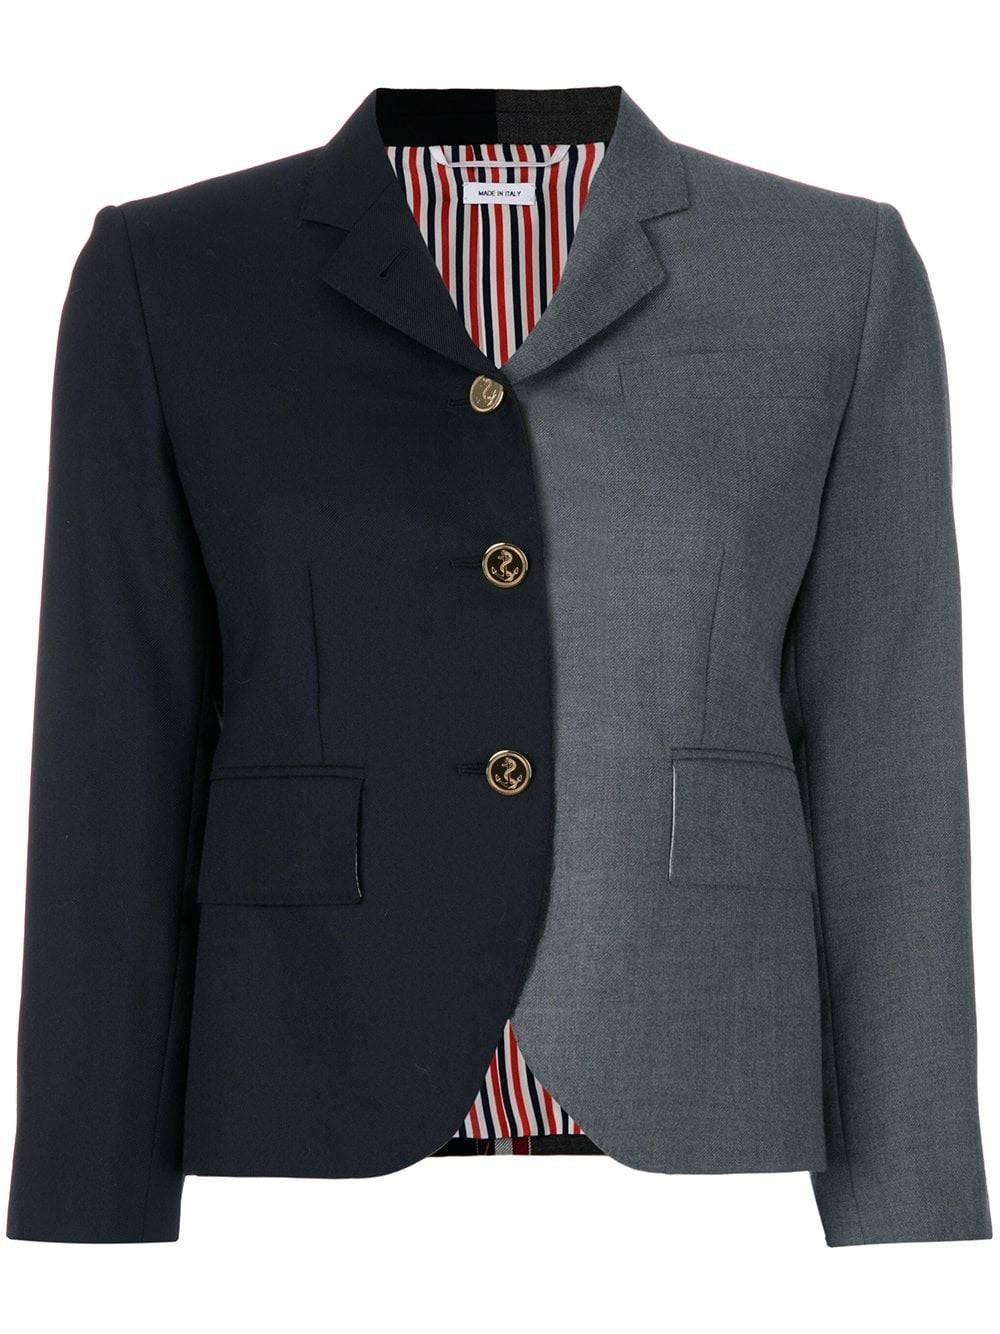 Thom Browne Grey Two-tone Sport Coat